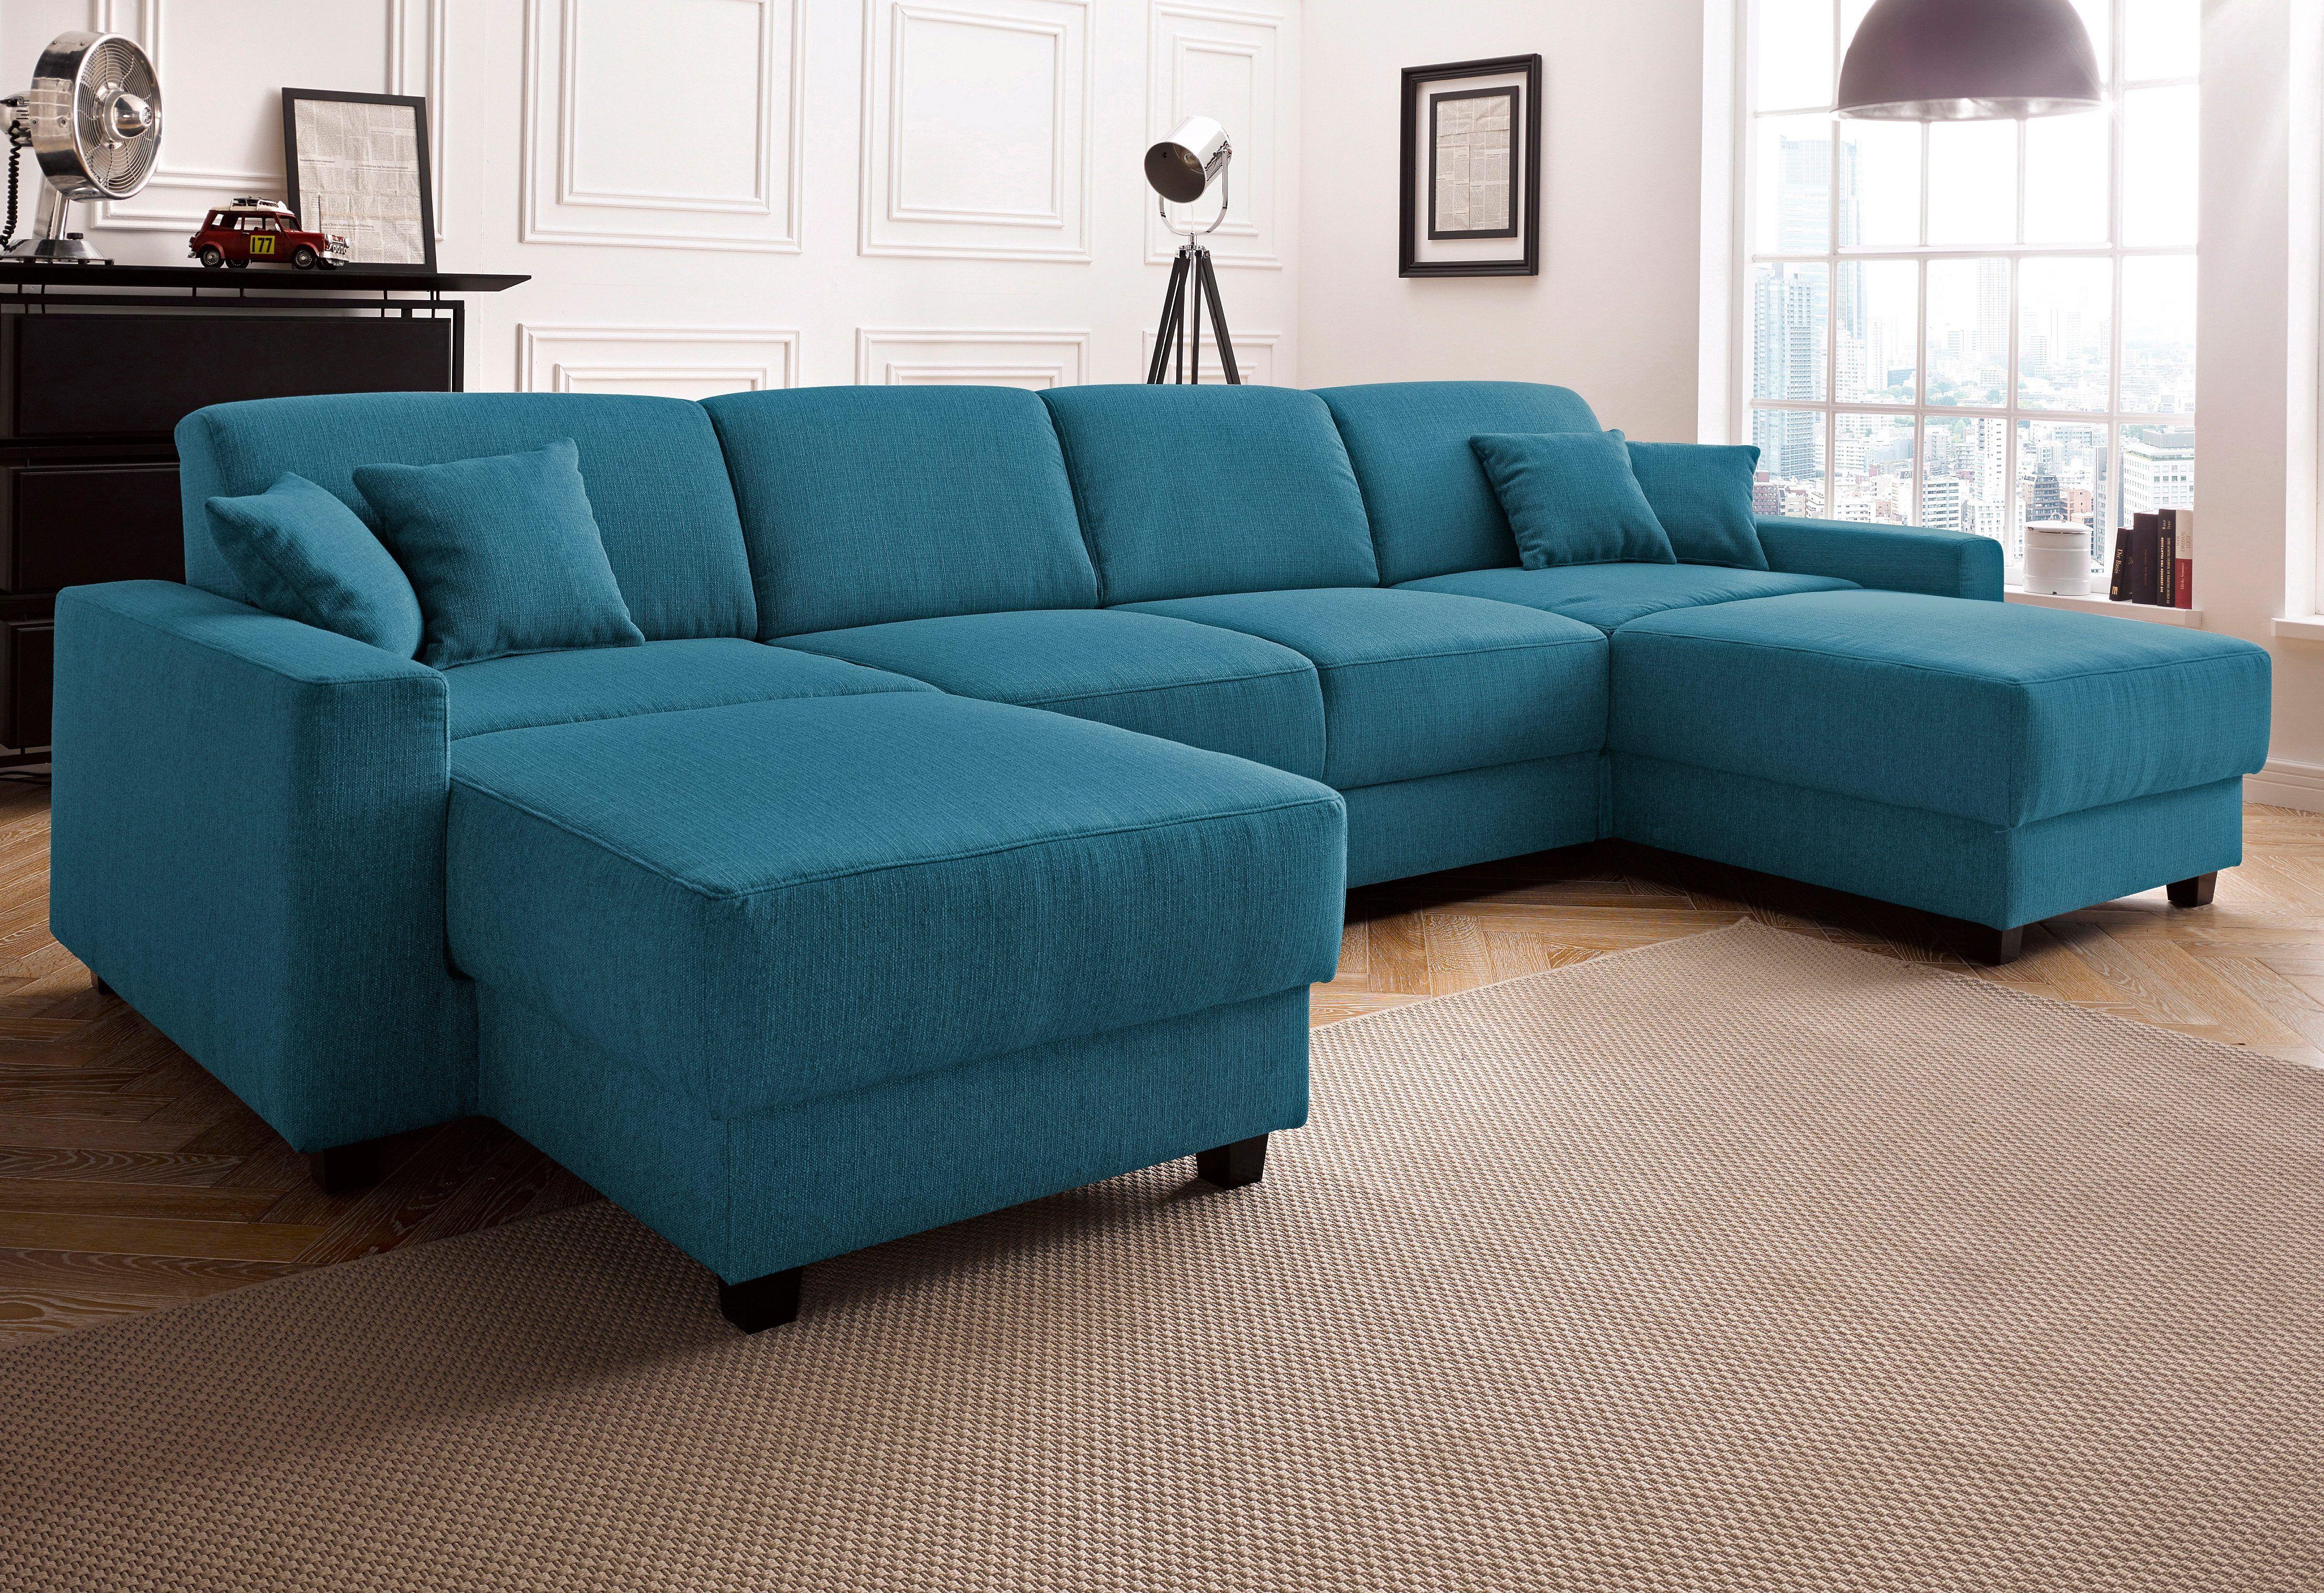 Wohnlandschaft Grün, Ohne Relaxfunktion, FSC® Zertifiziert, Yourhome Jetzt  Bestellen Unter: